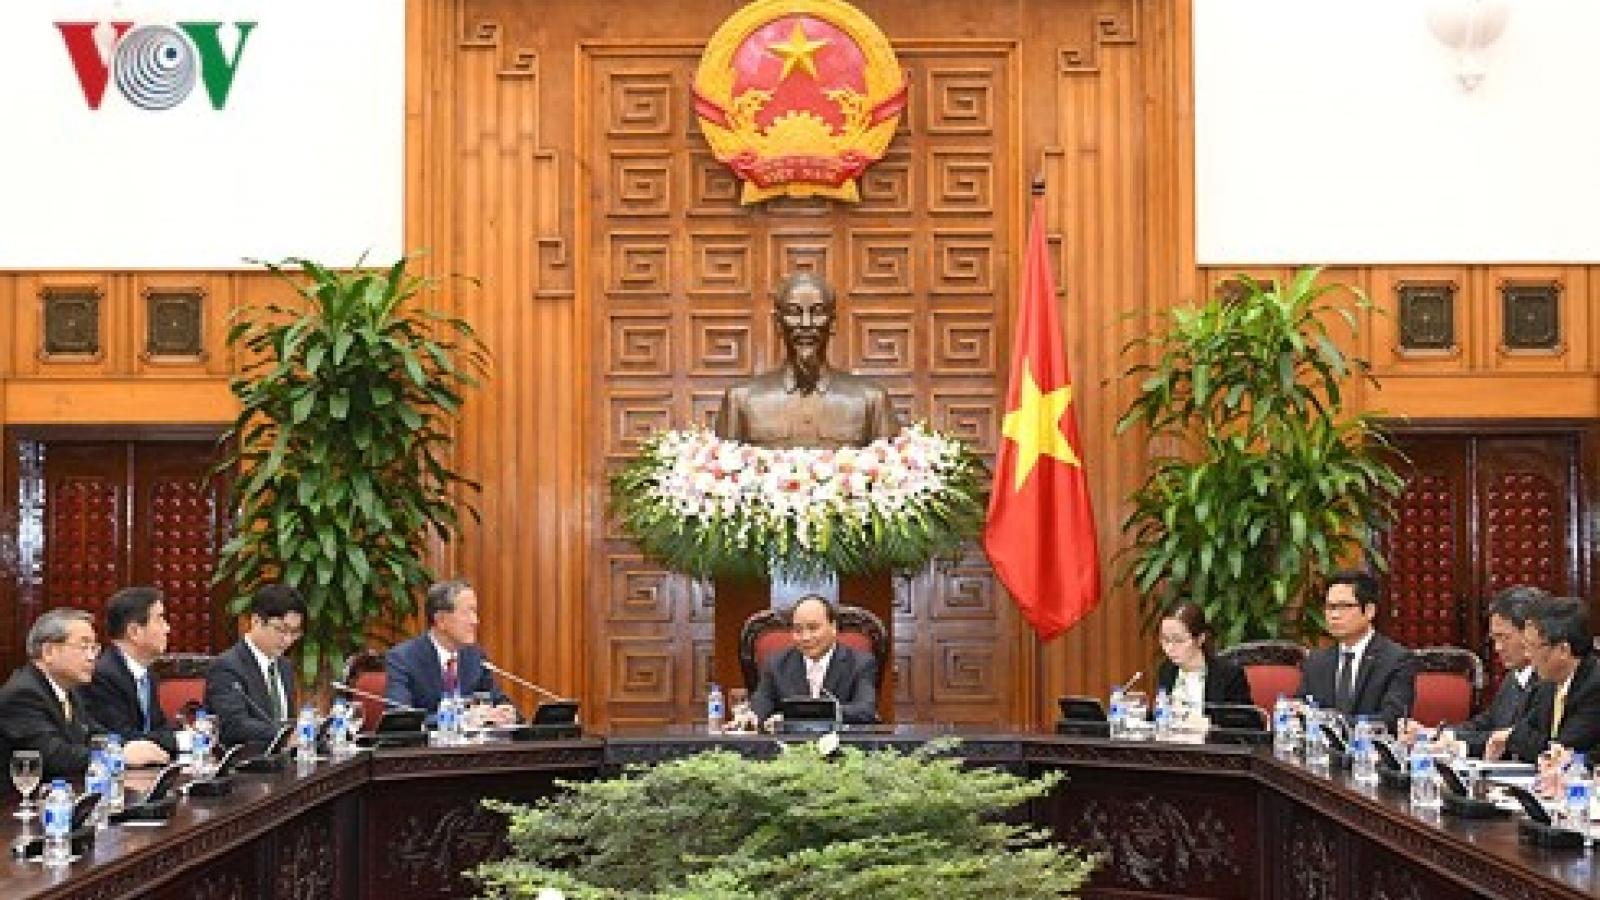 PM Phuc appreciates RoK's continued investments in Vietnam